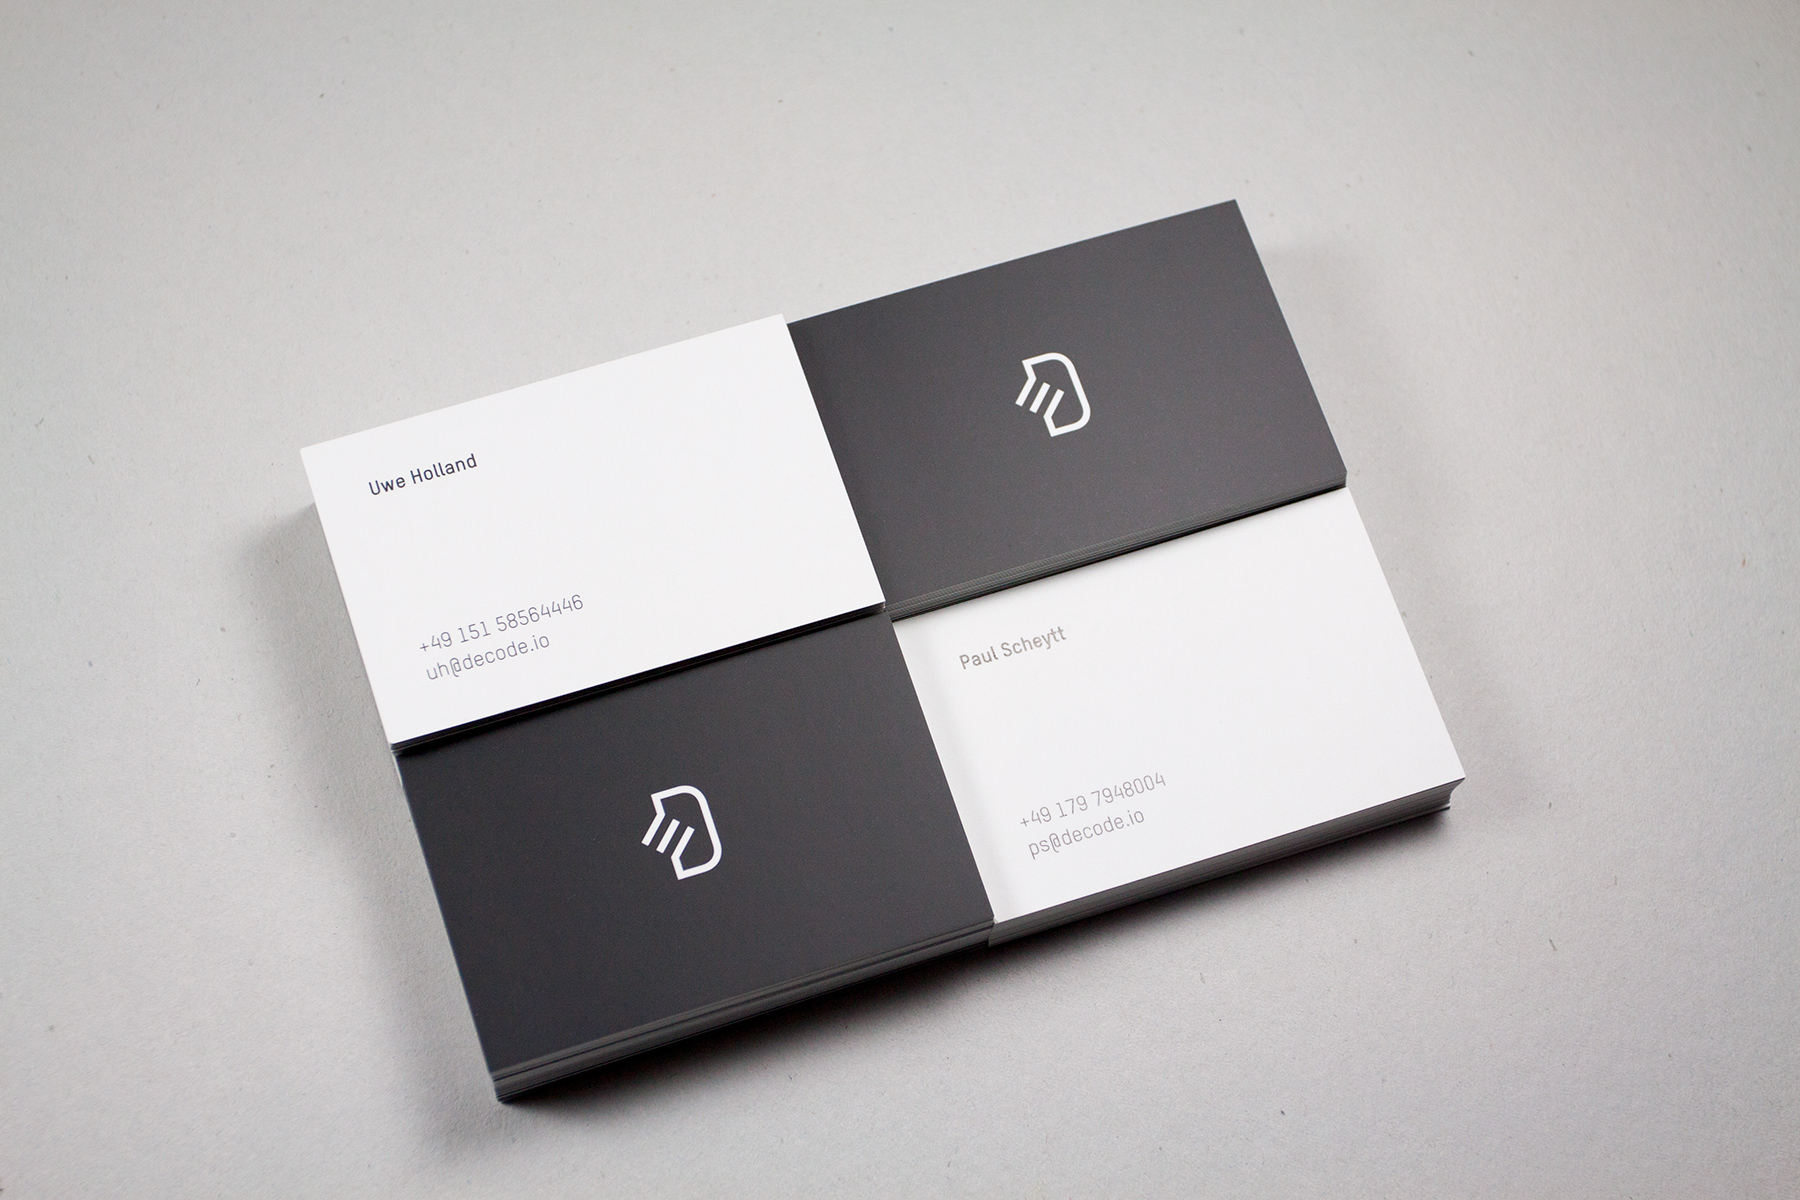 decode-business-cards-buero-ink-01